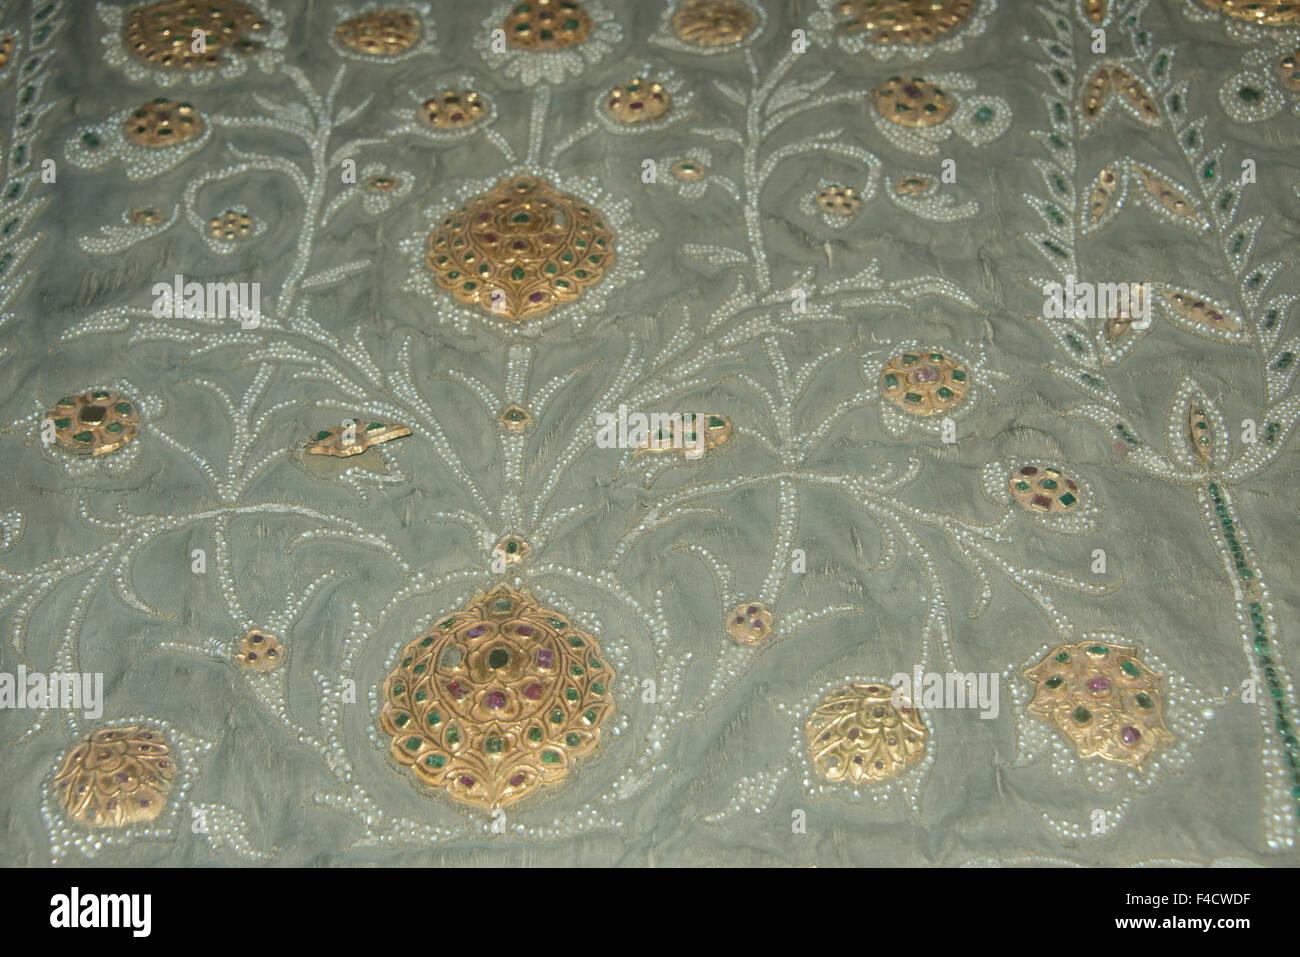 Asia Turkey Istanbul Topkapi Historic Palace Hand Embroidered